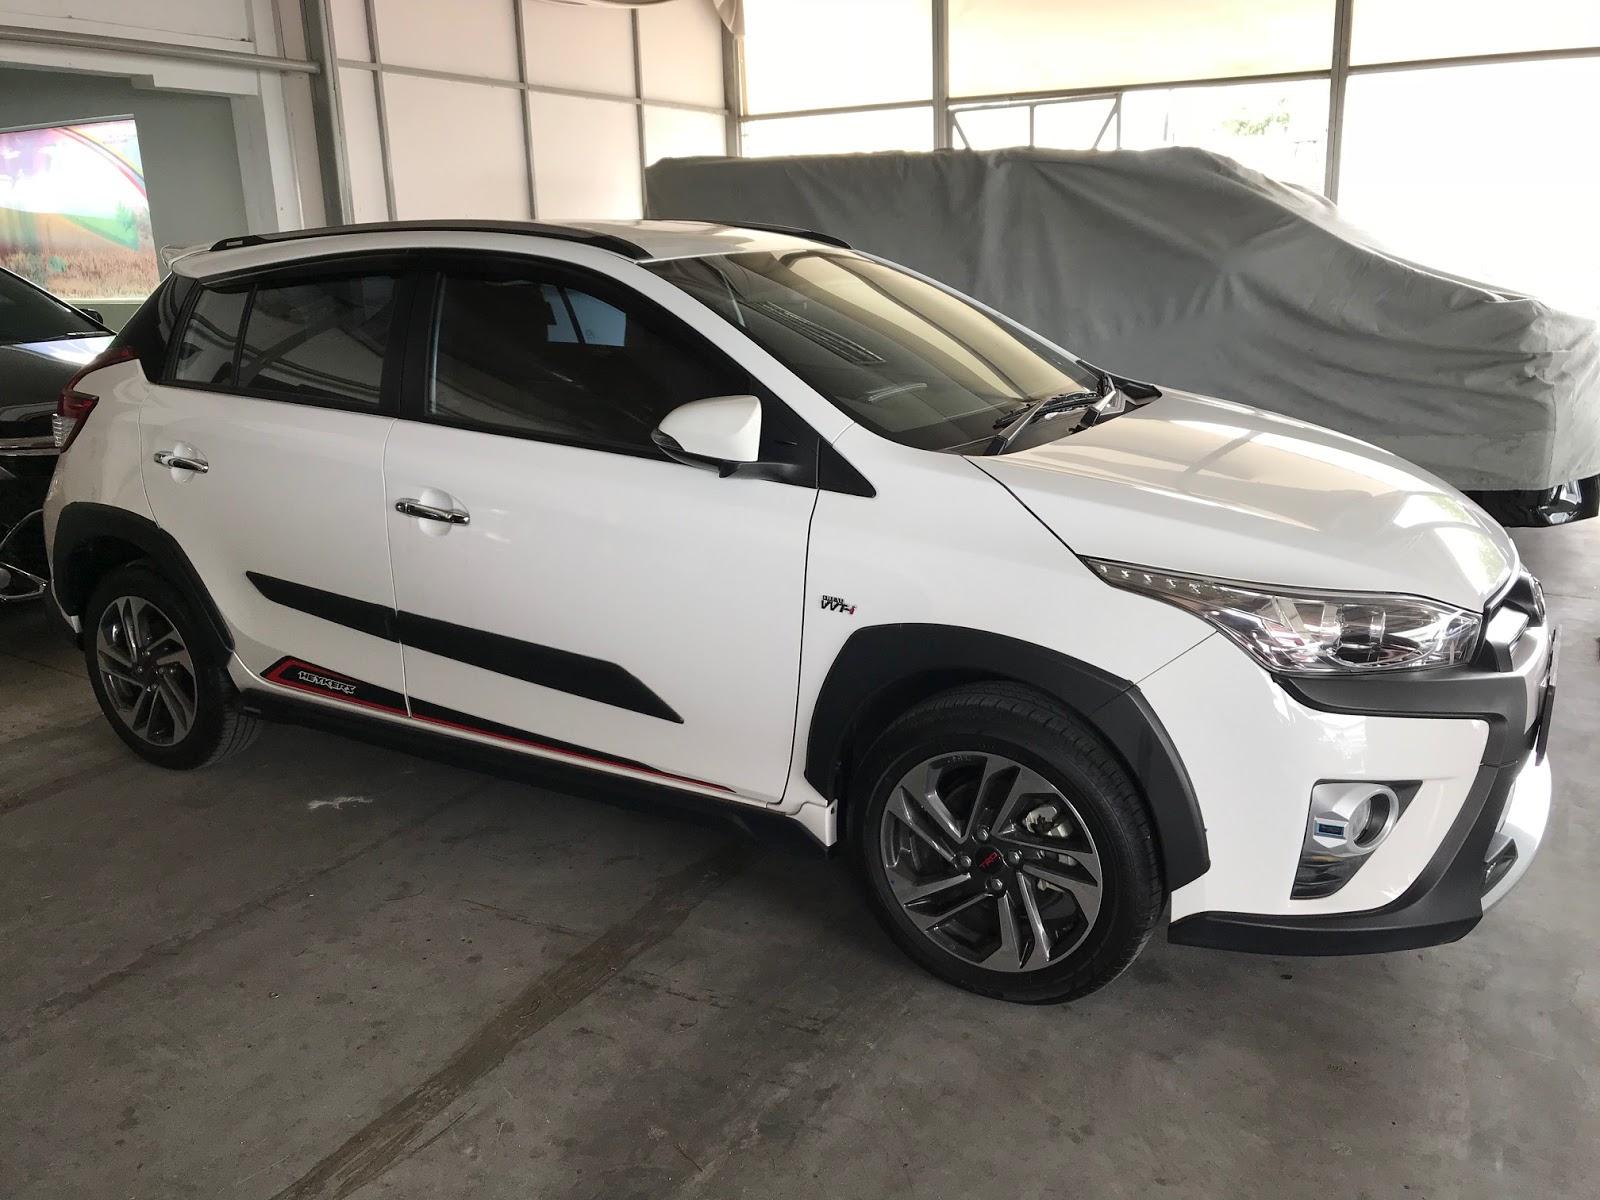 Toyota Yaris Trd Heykers Kekurangan All New Foto Pekanbaru